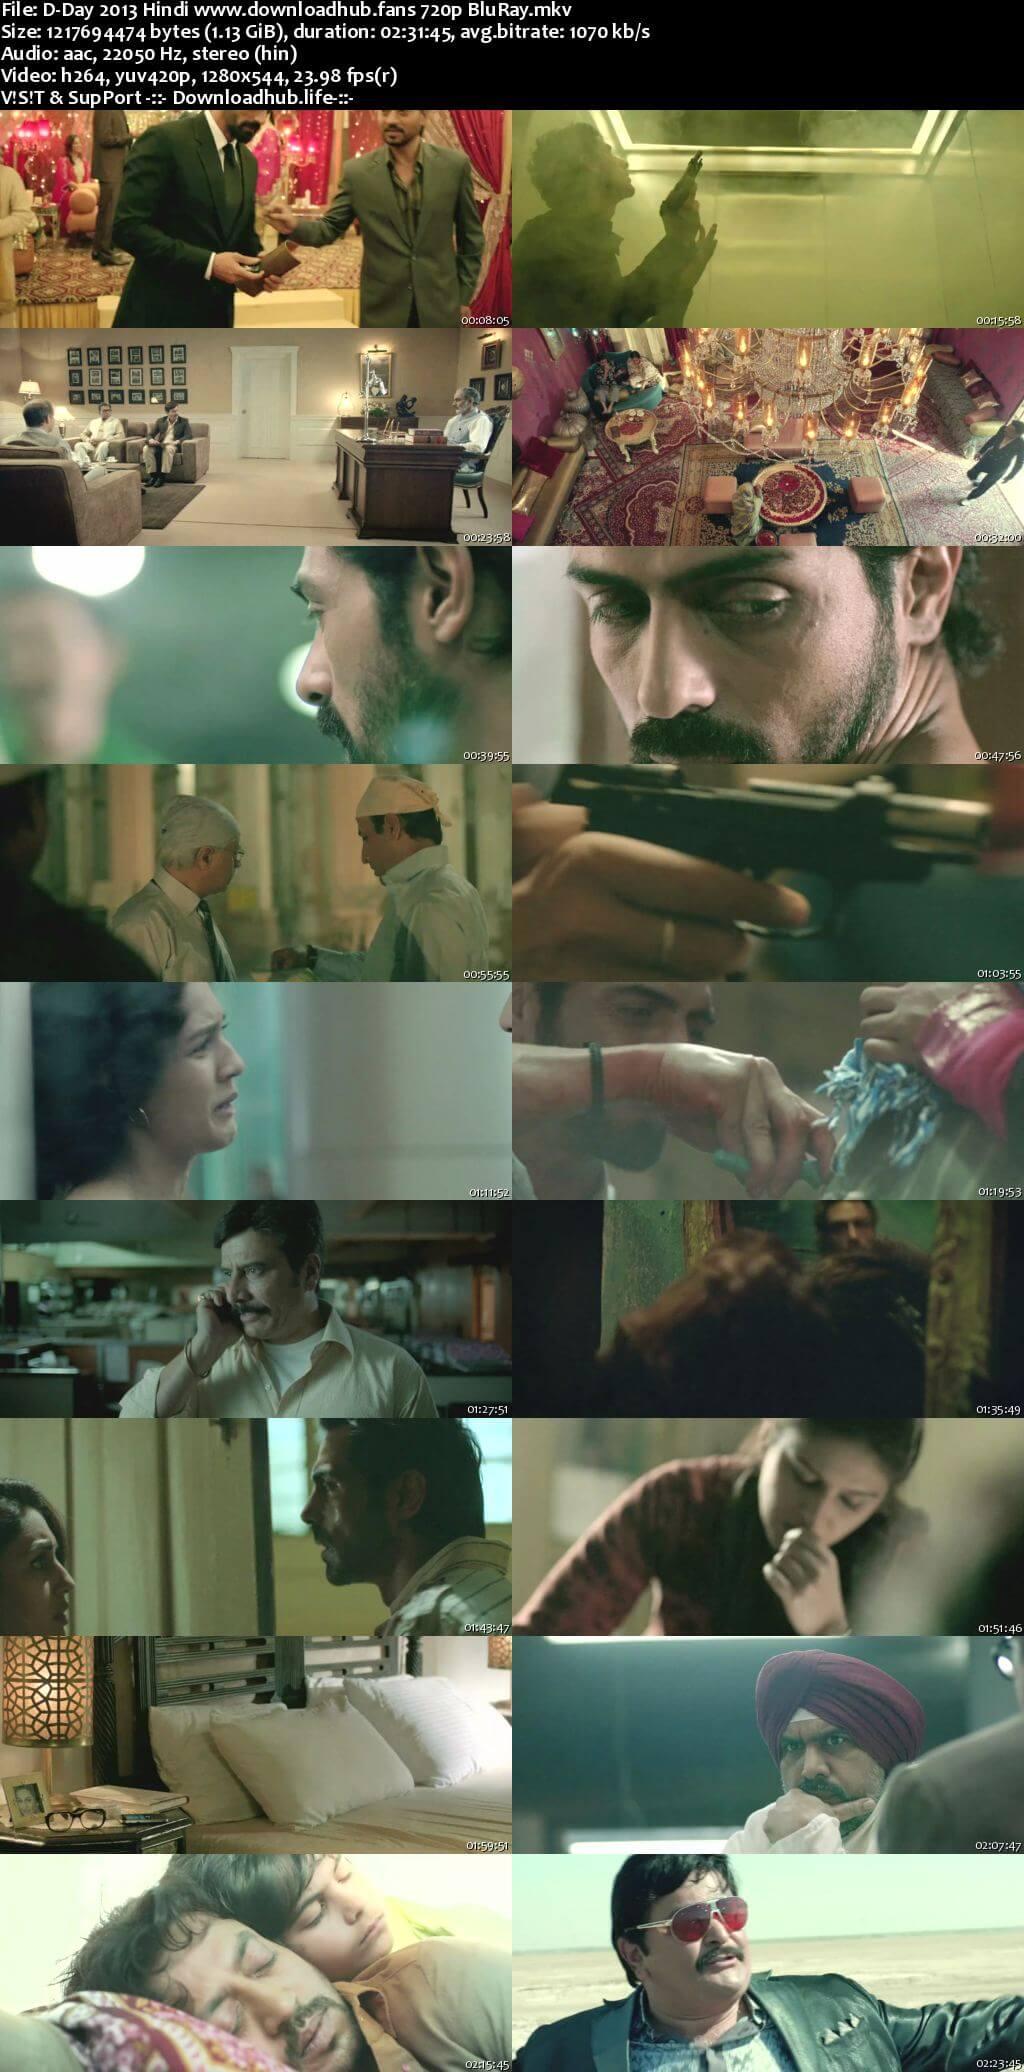 D-Day 2013 Hindi 720p BluRay x264